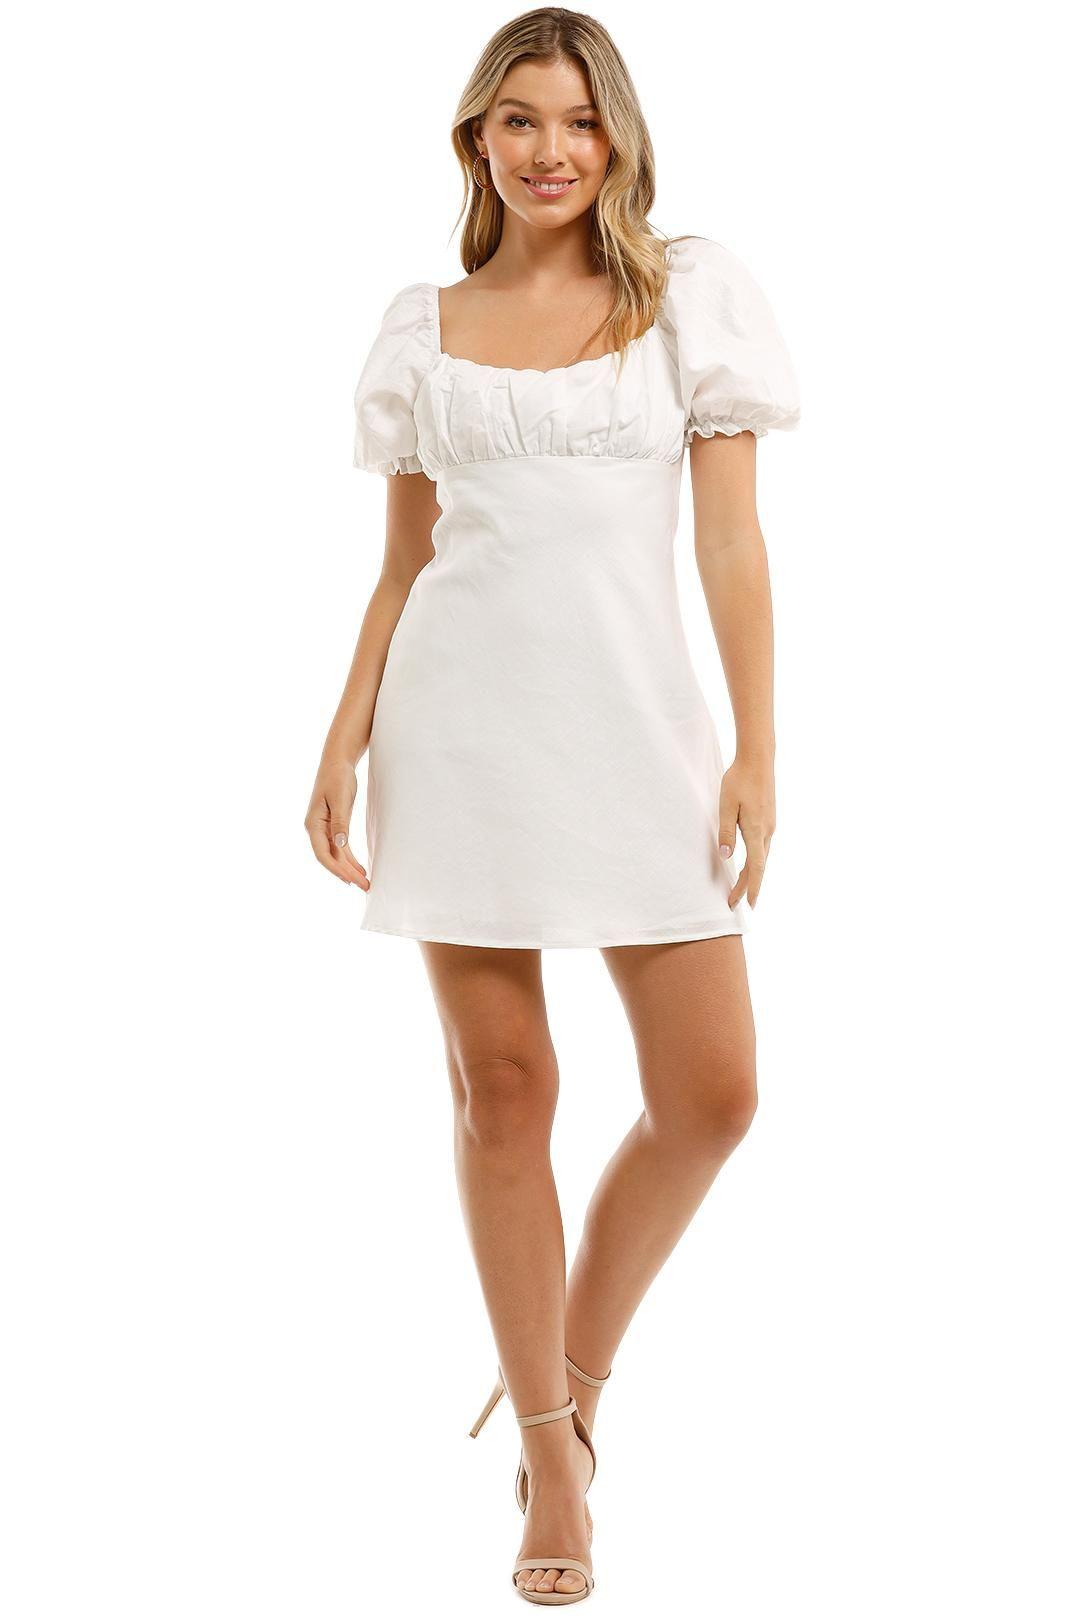 Charlie Holiday Lottie Mini Dress White